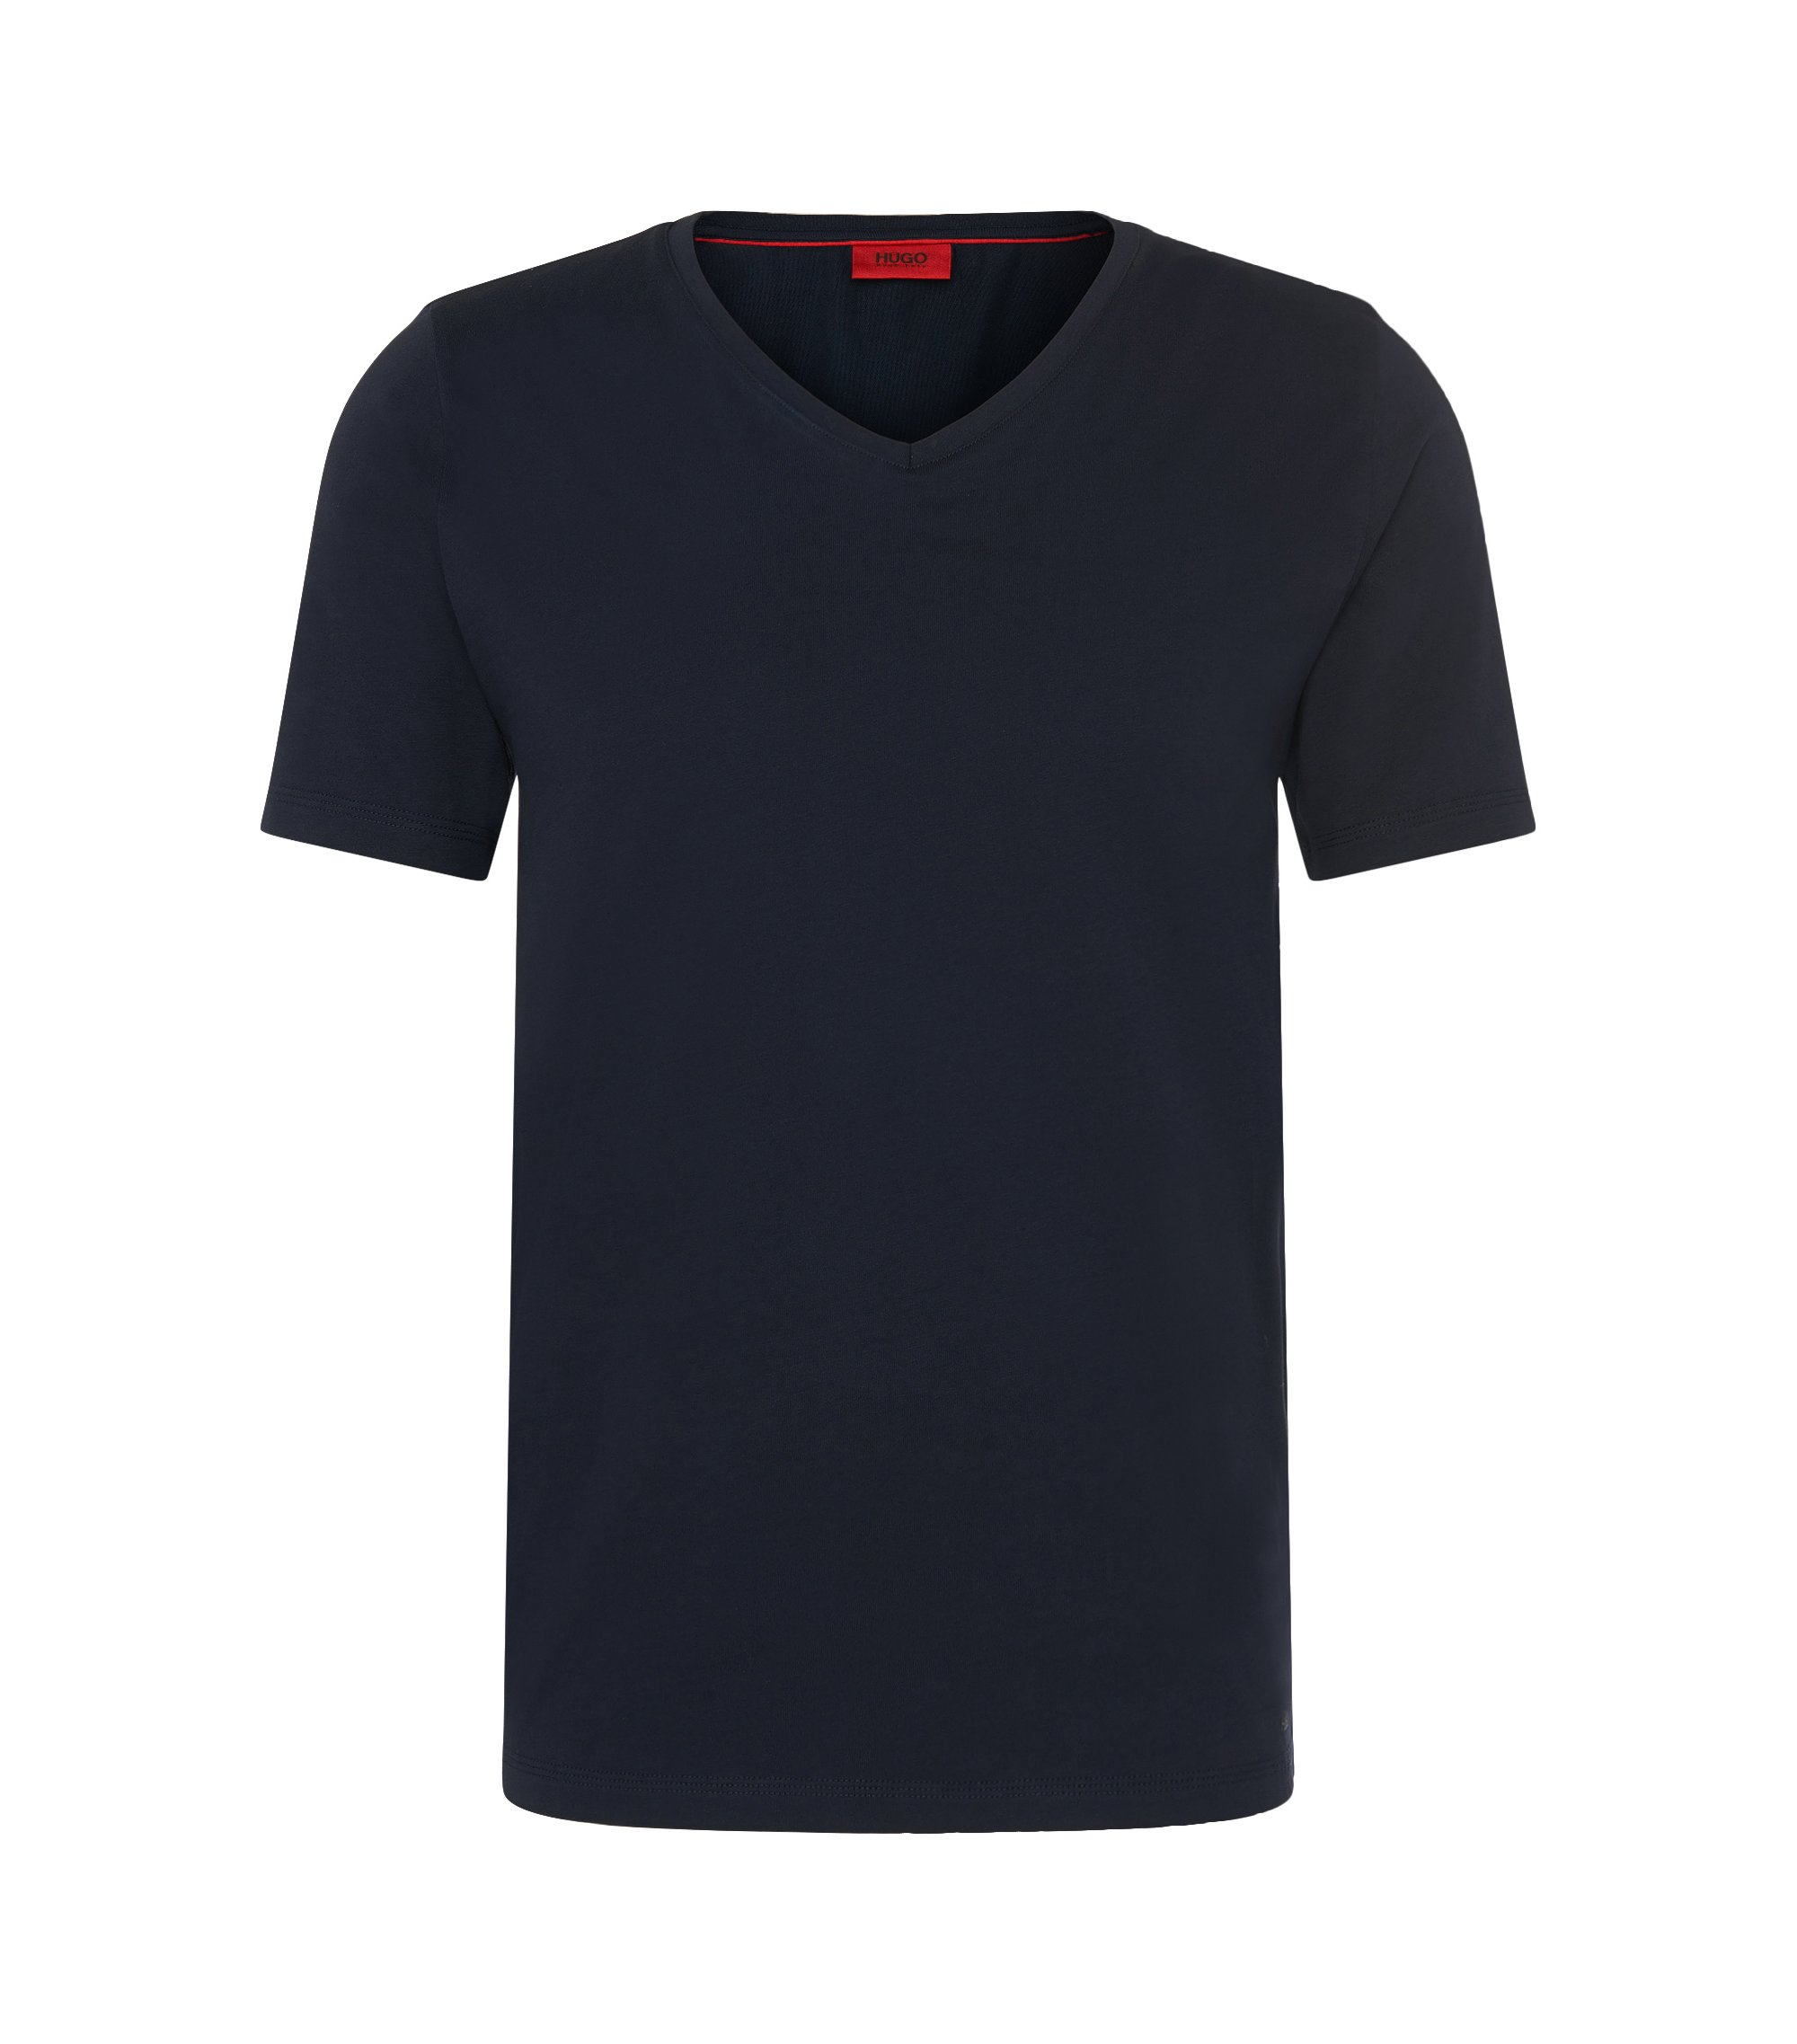 Unifarbenes Slim-Fit T-Shirt aus Baumwolle: 'Danny', Dunkelblau